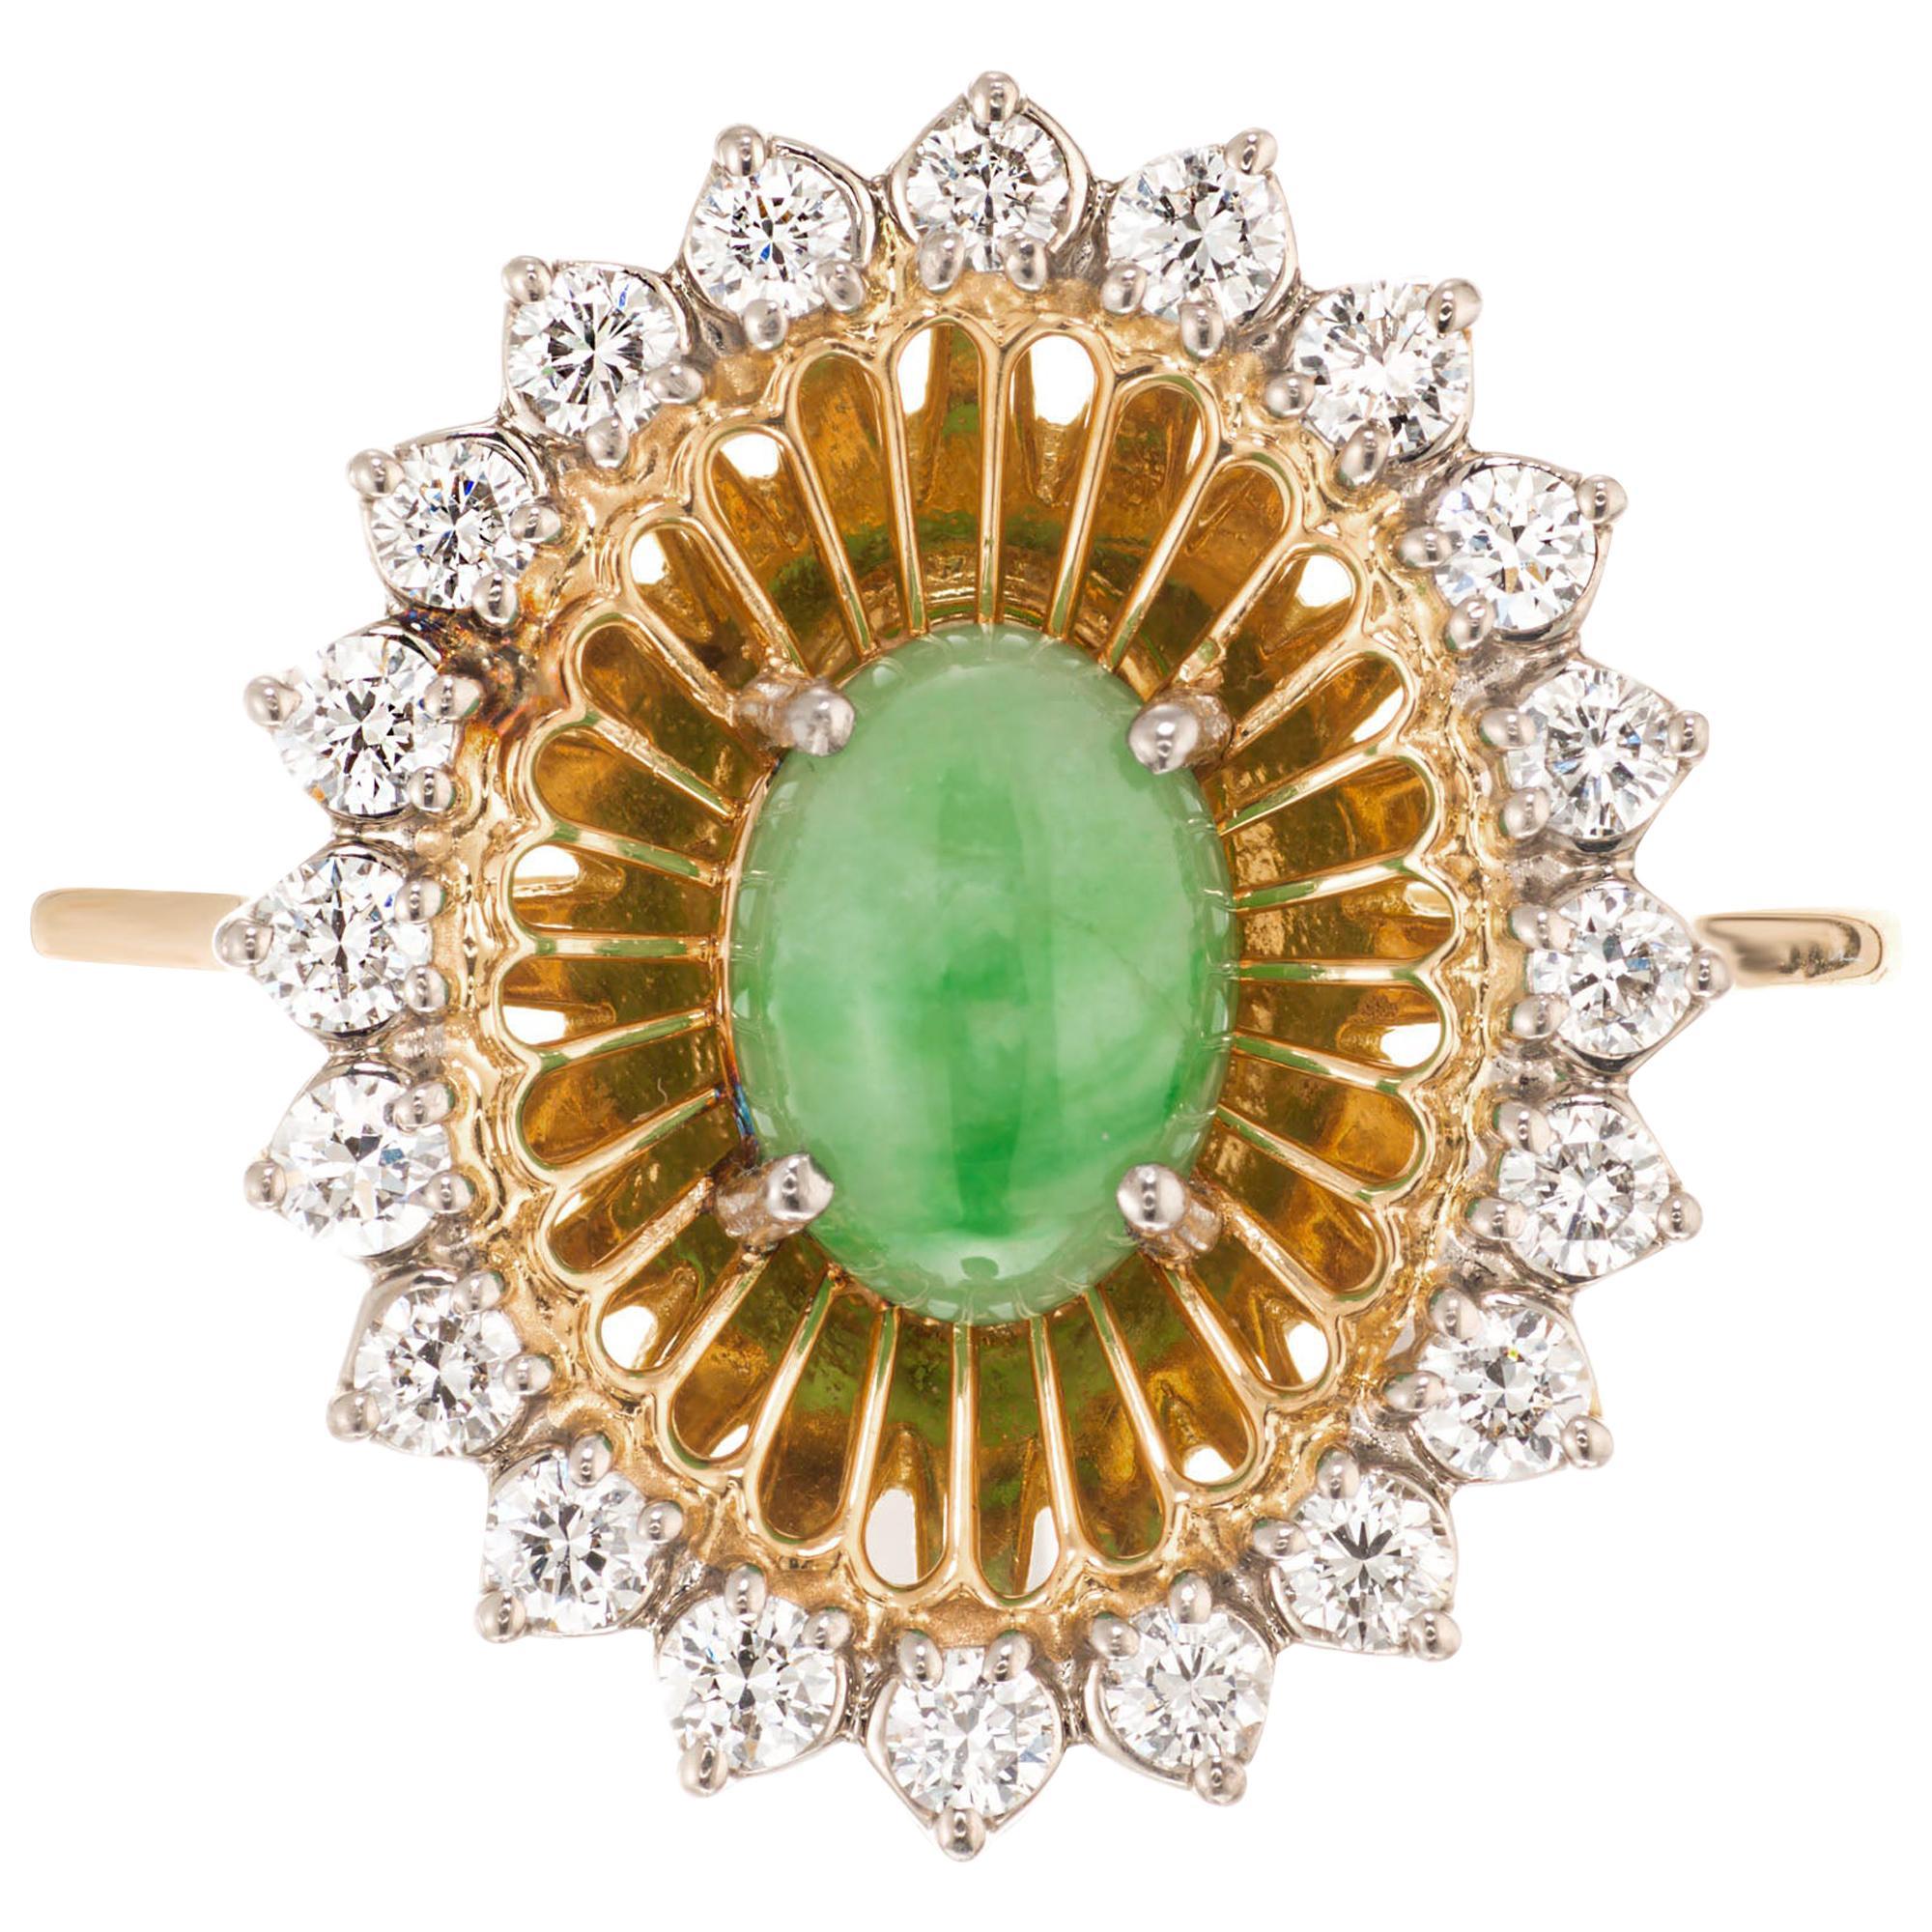 GIA Certified .75 Carat Jadeite Jade Diamond Yellow Gold Cocktail Ring